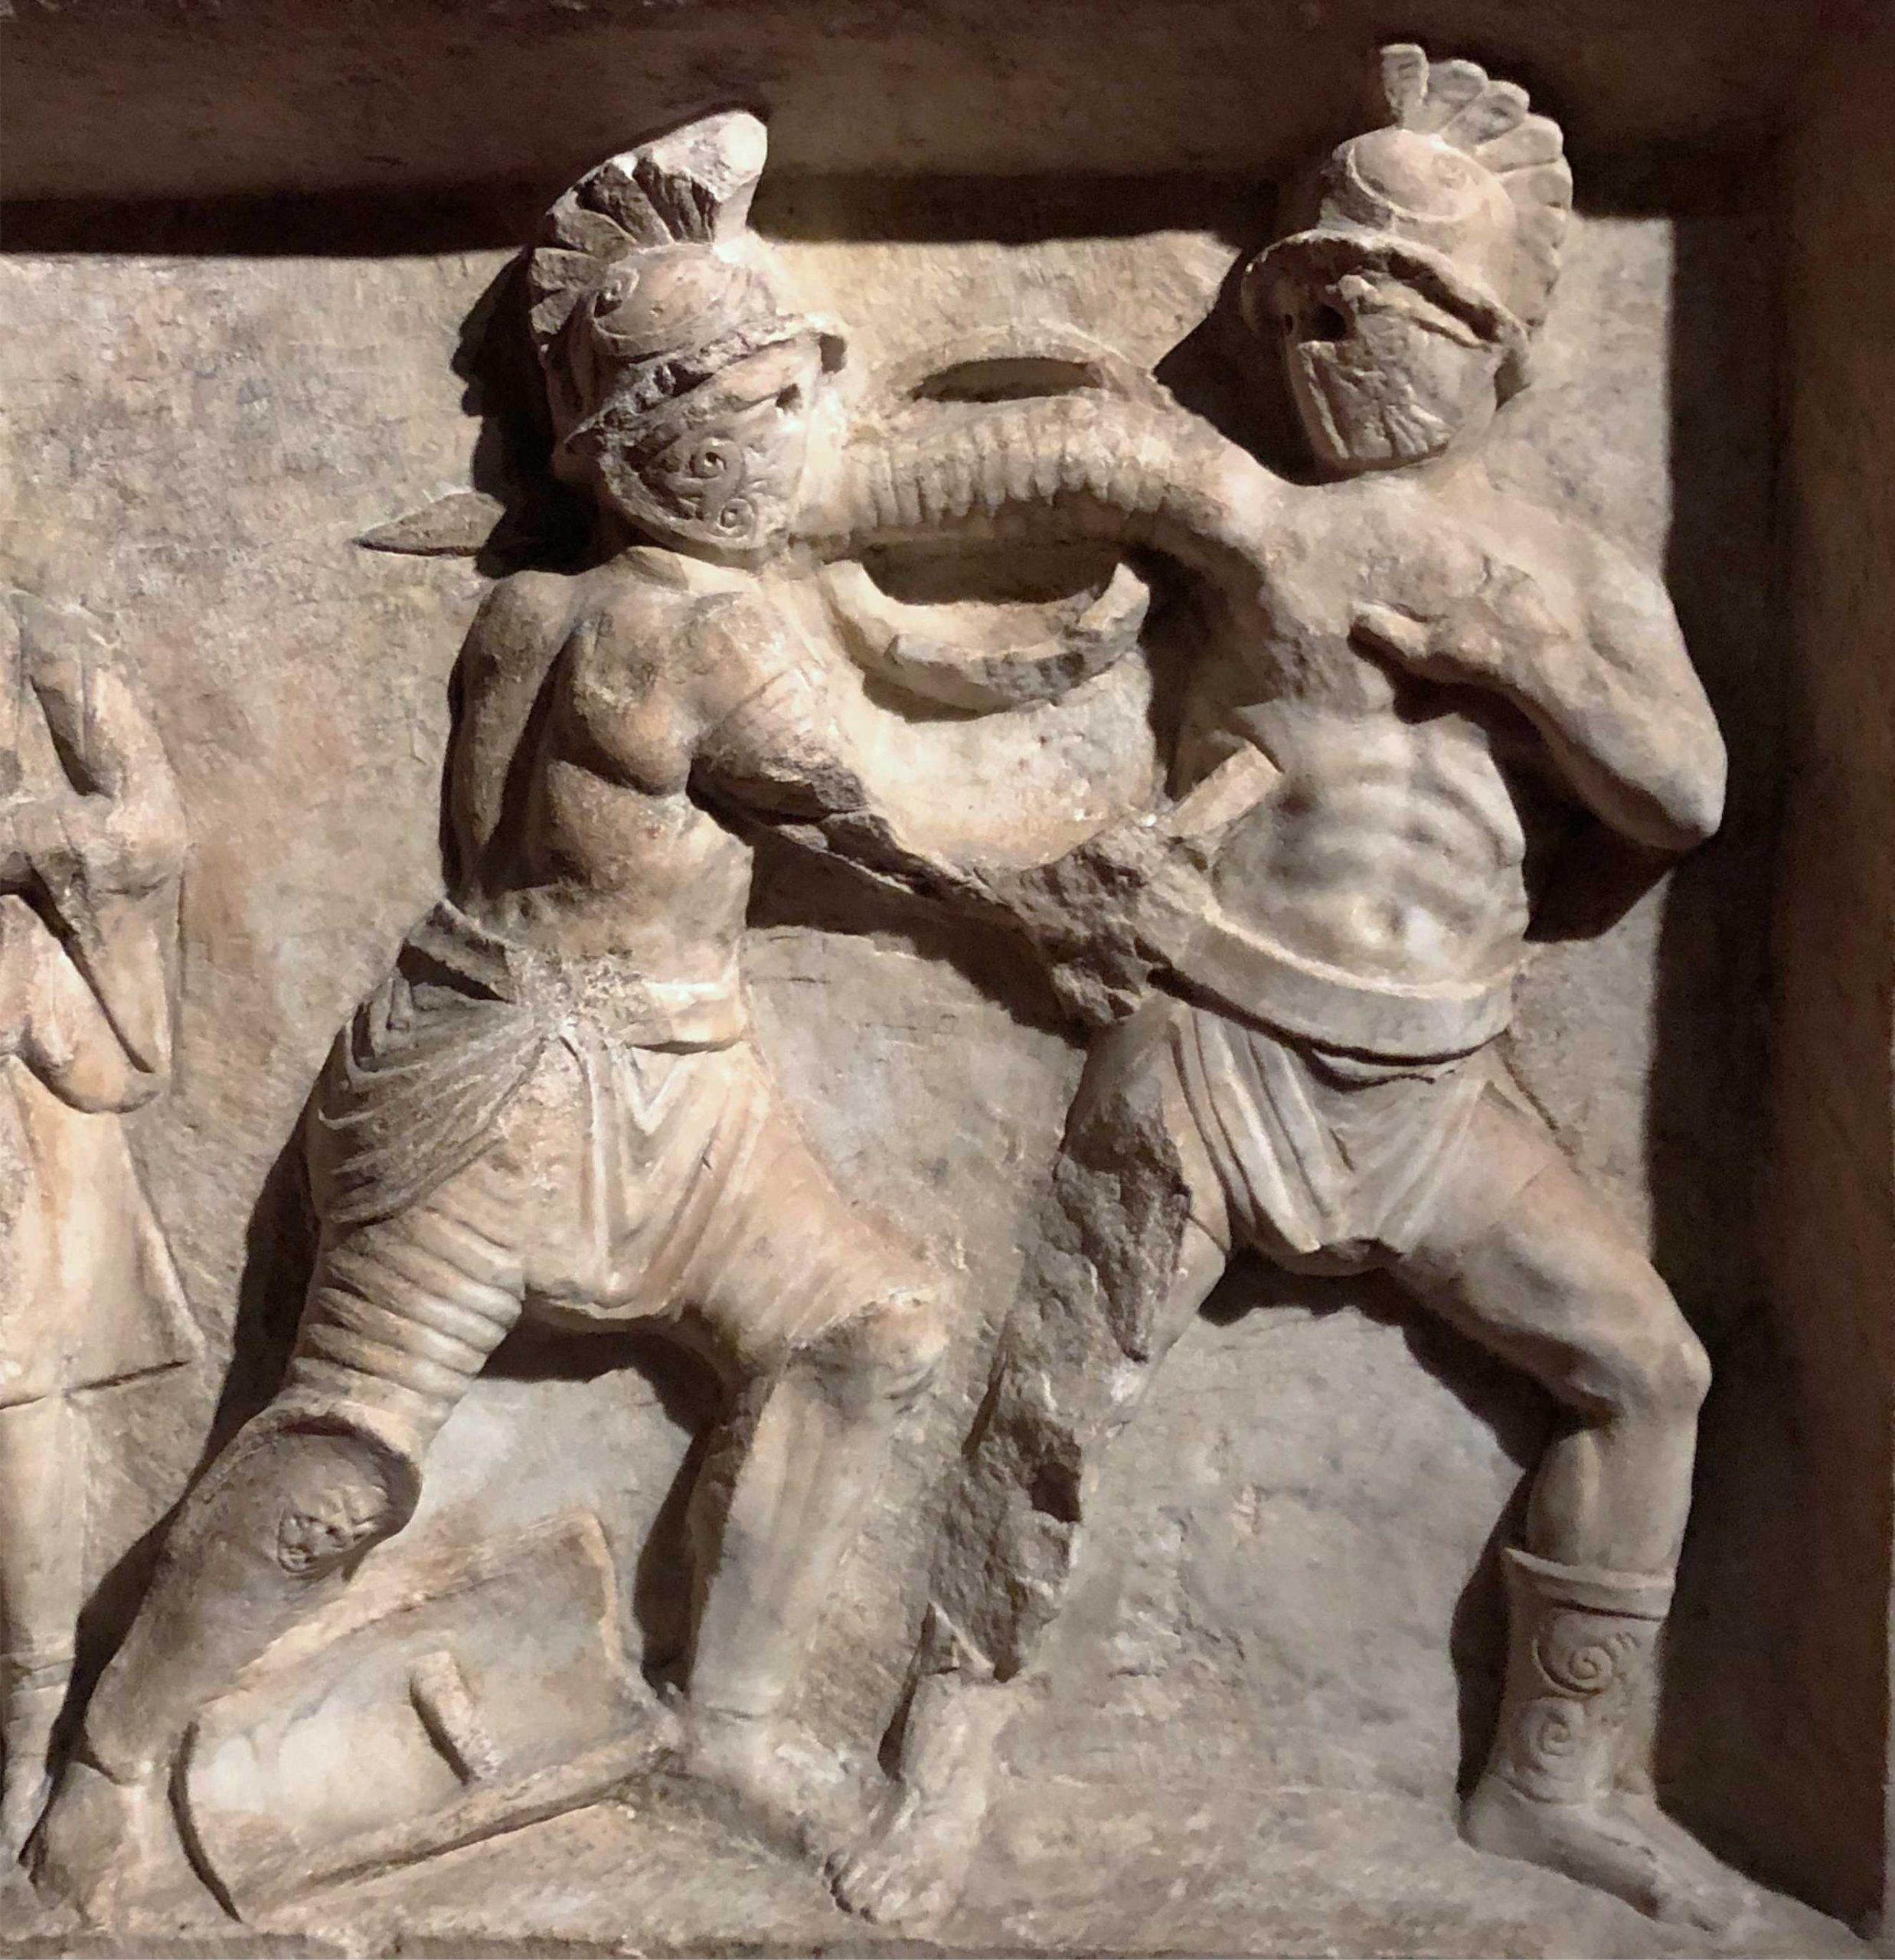 Arch. Museum Harburg -Gladiatorenkämpge: Relief in Pompeji